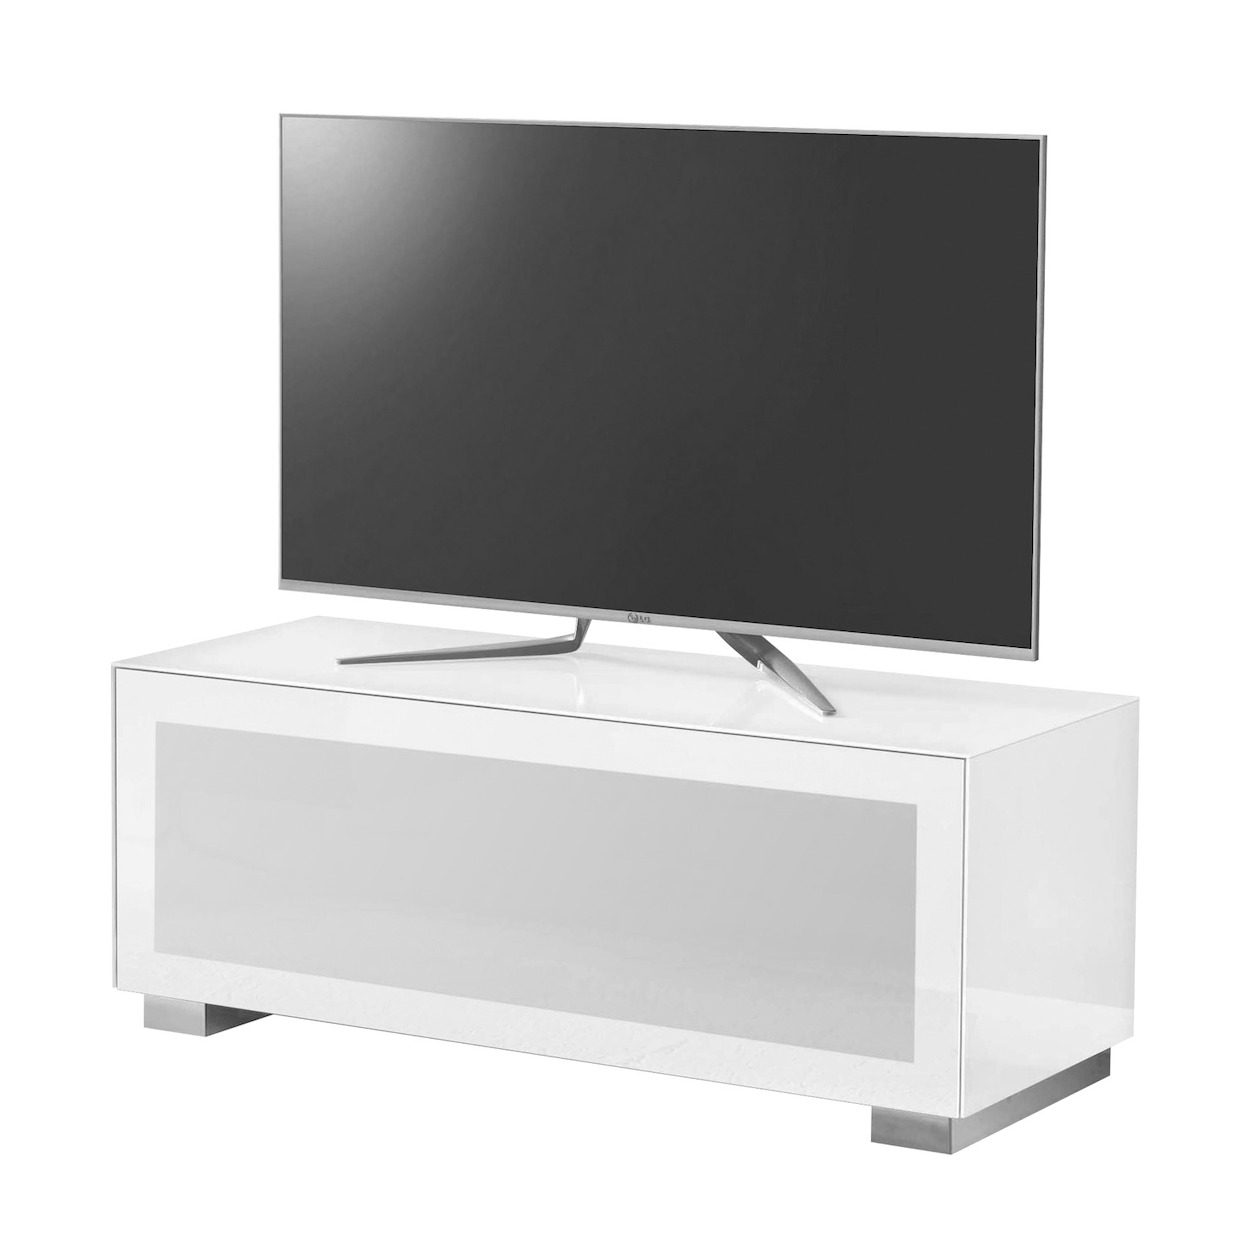 Aldenkamp tv meubel MG125 BI BI wit